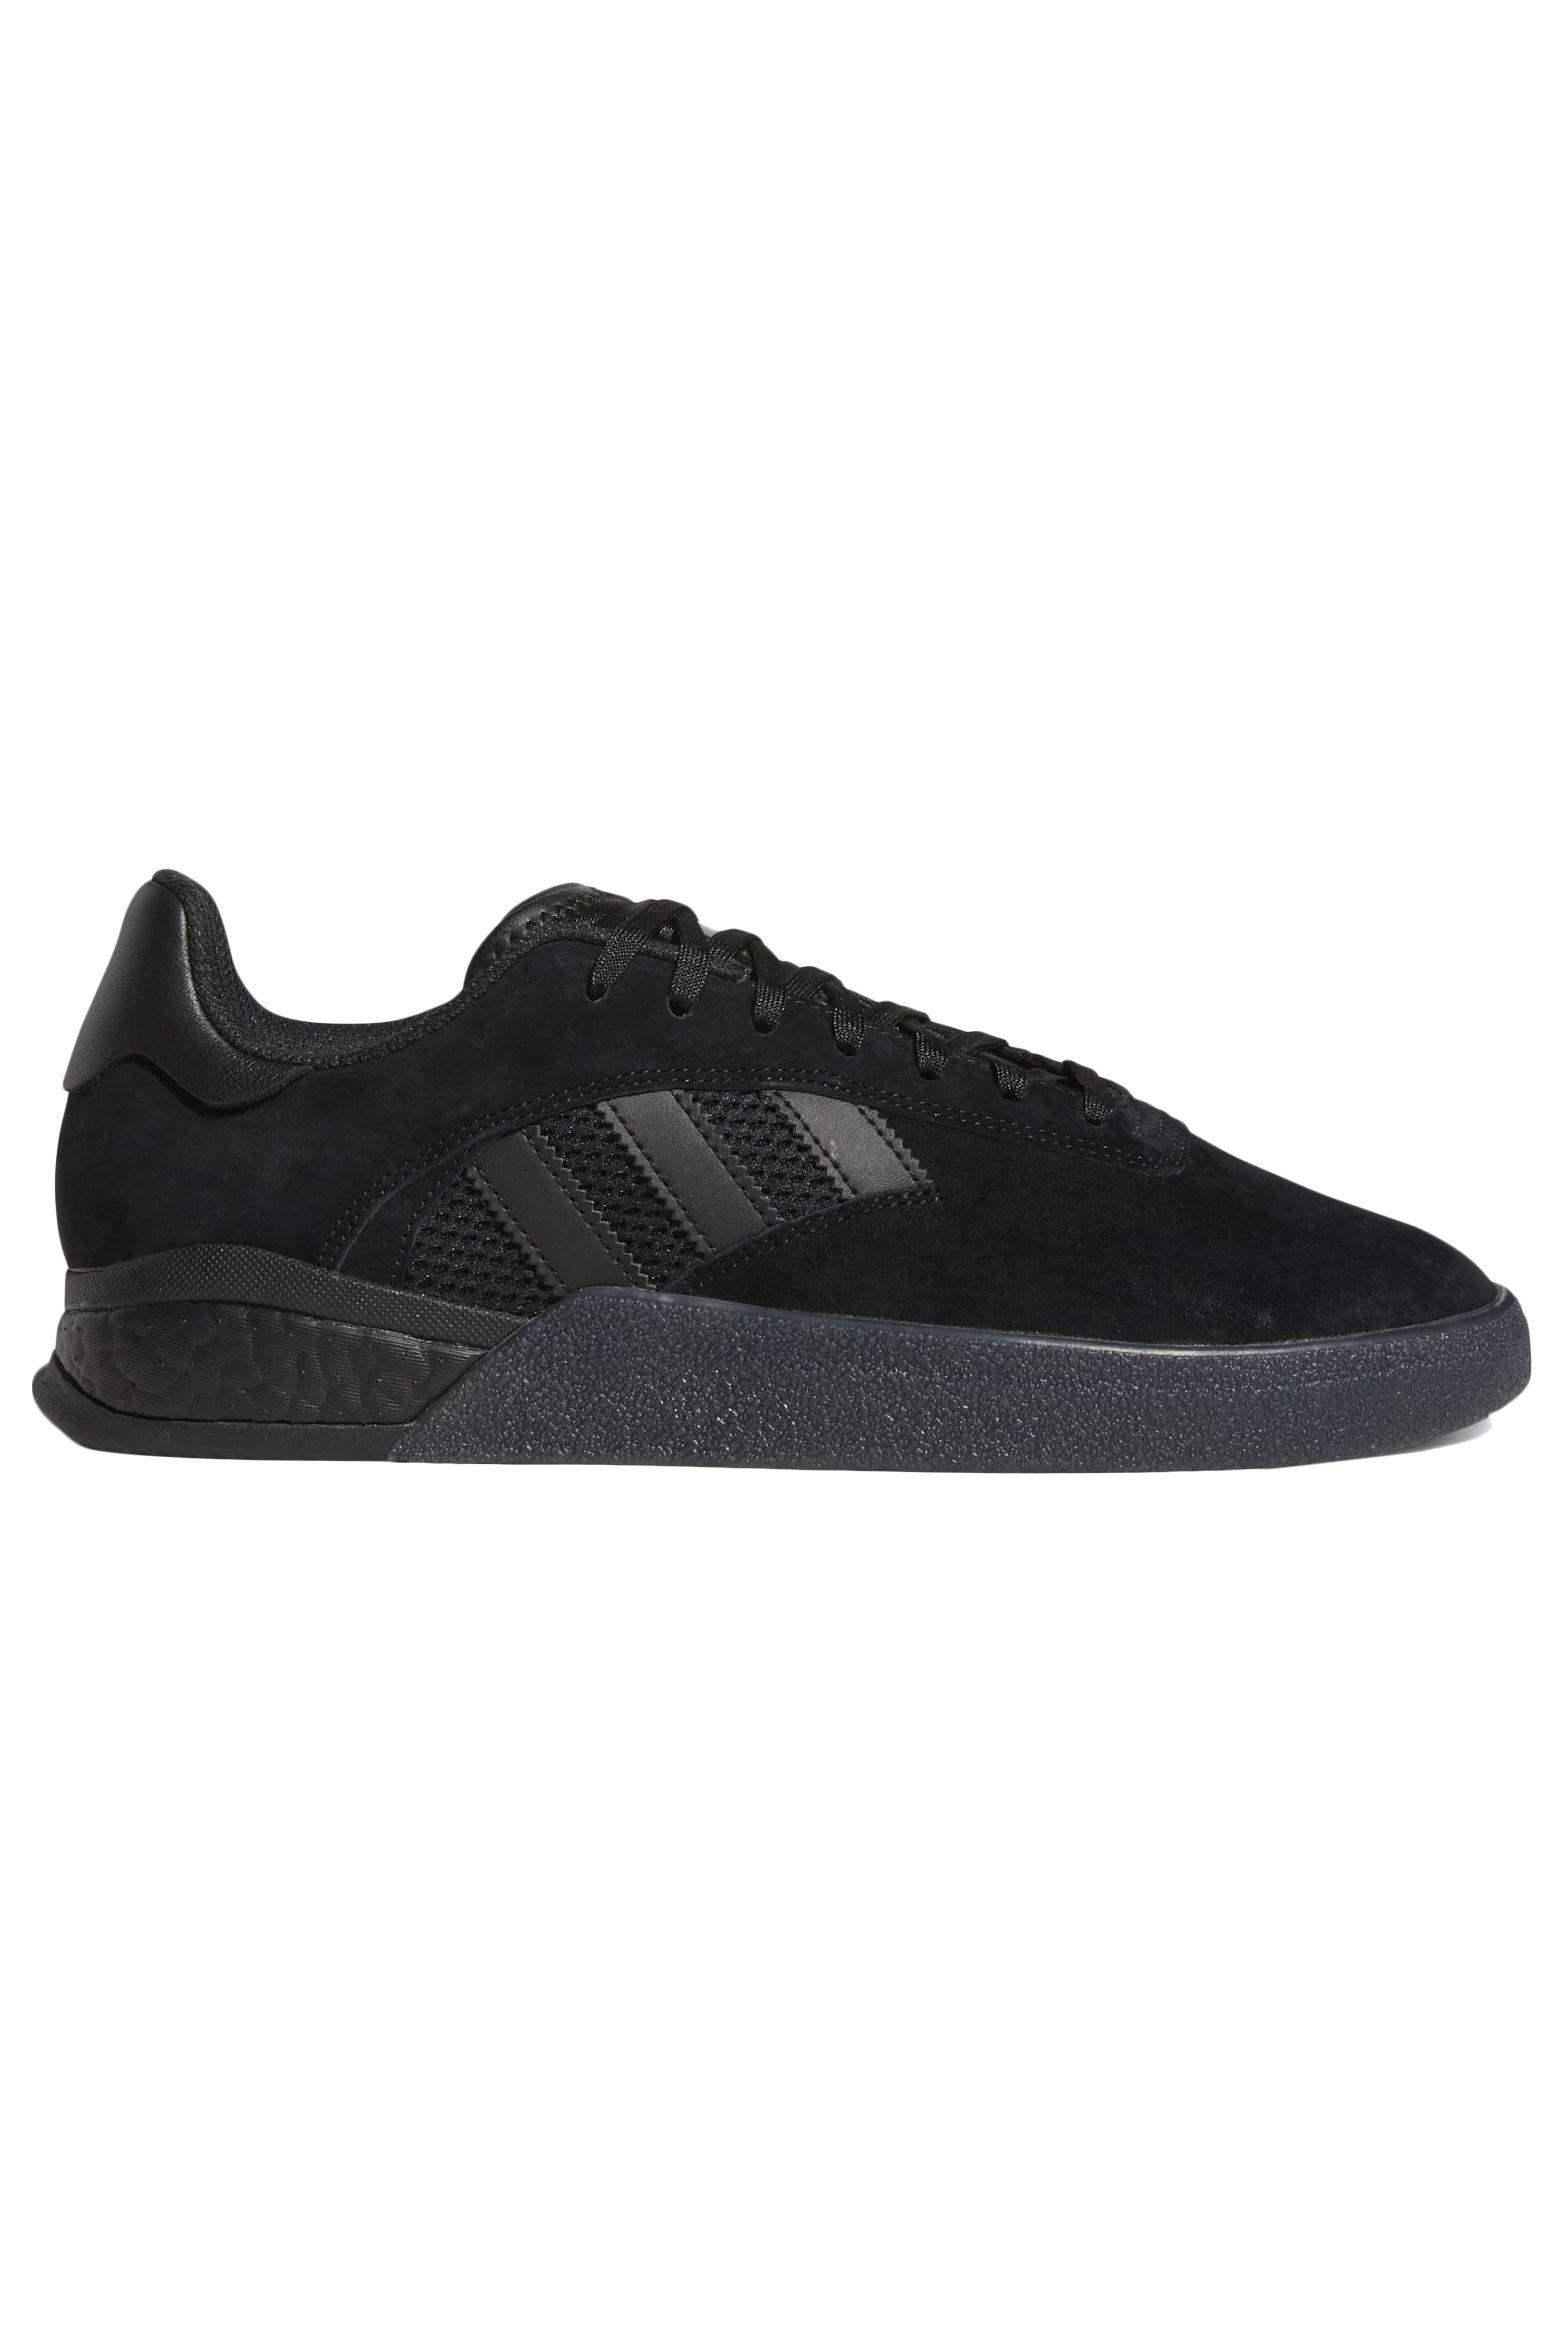 Tenis Adidas 3ST.004 Core Black/Core Black/Core Black